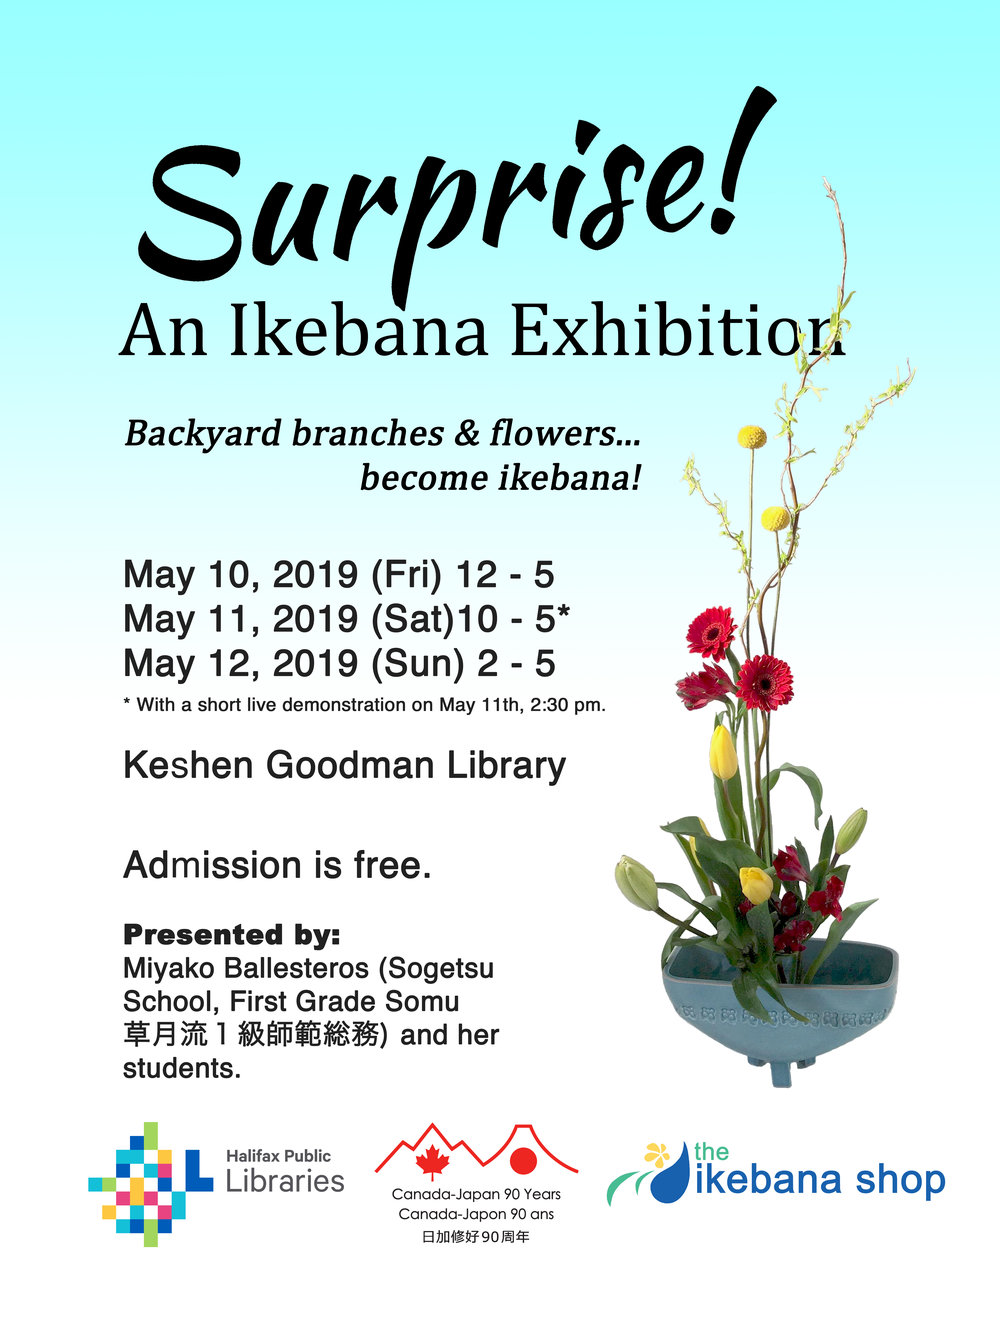 2019 ikebana Sogetsu Exhibit in Halifax.